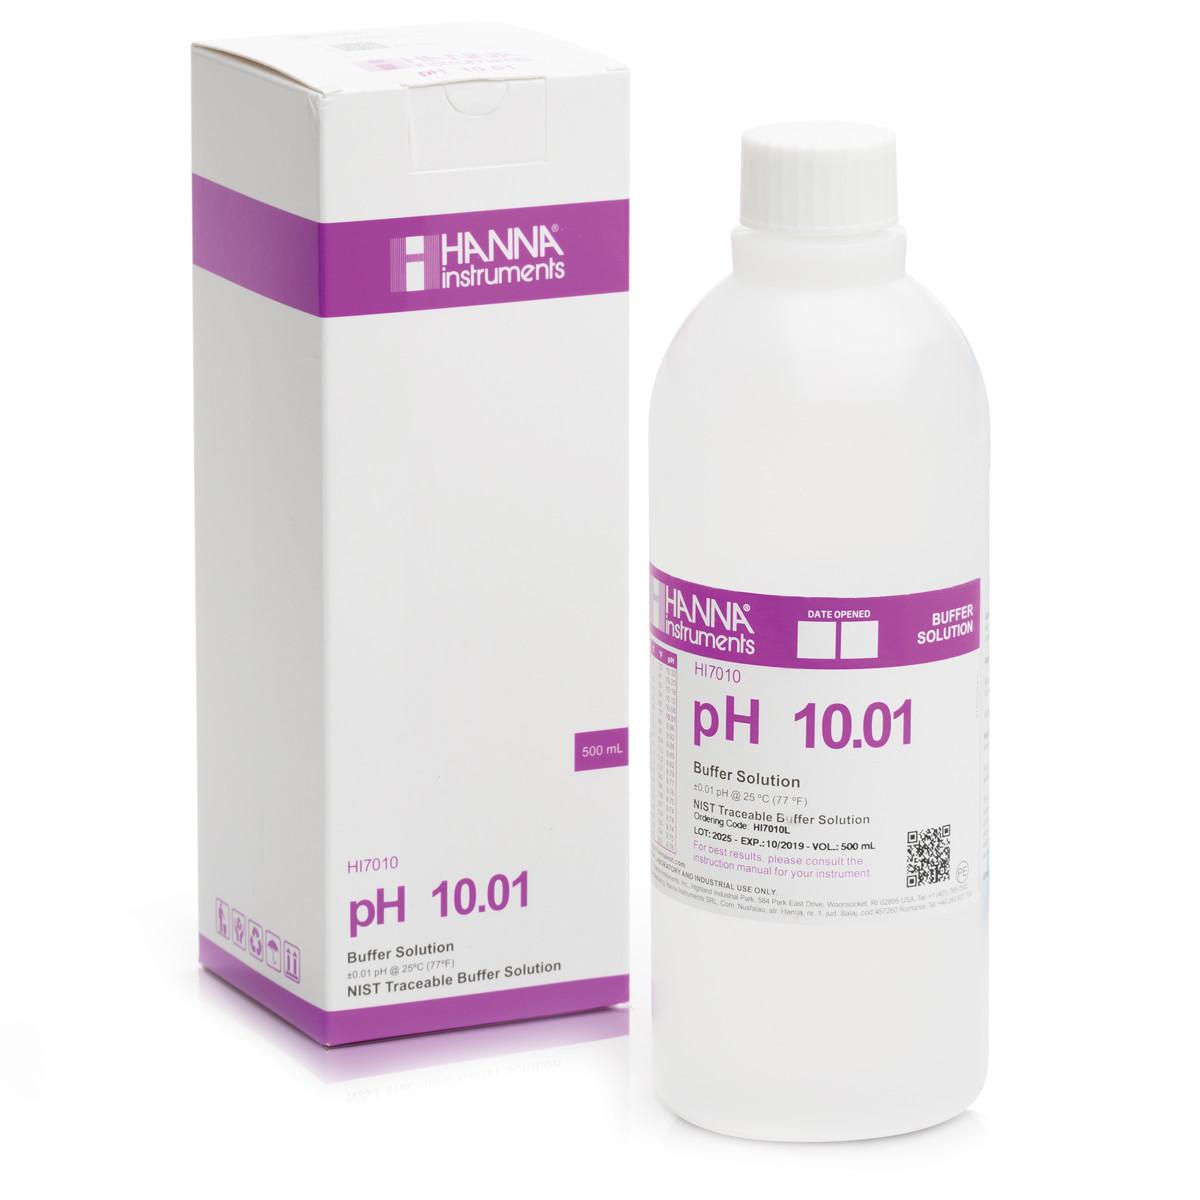 pH 10.01 Calibration Solution (500 mL)